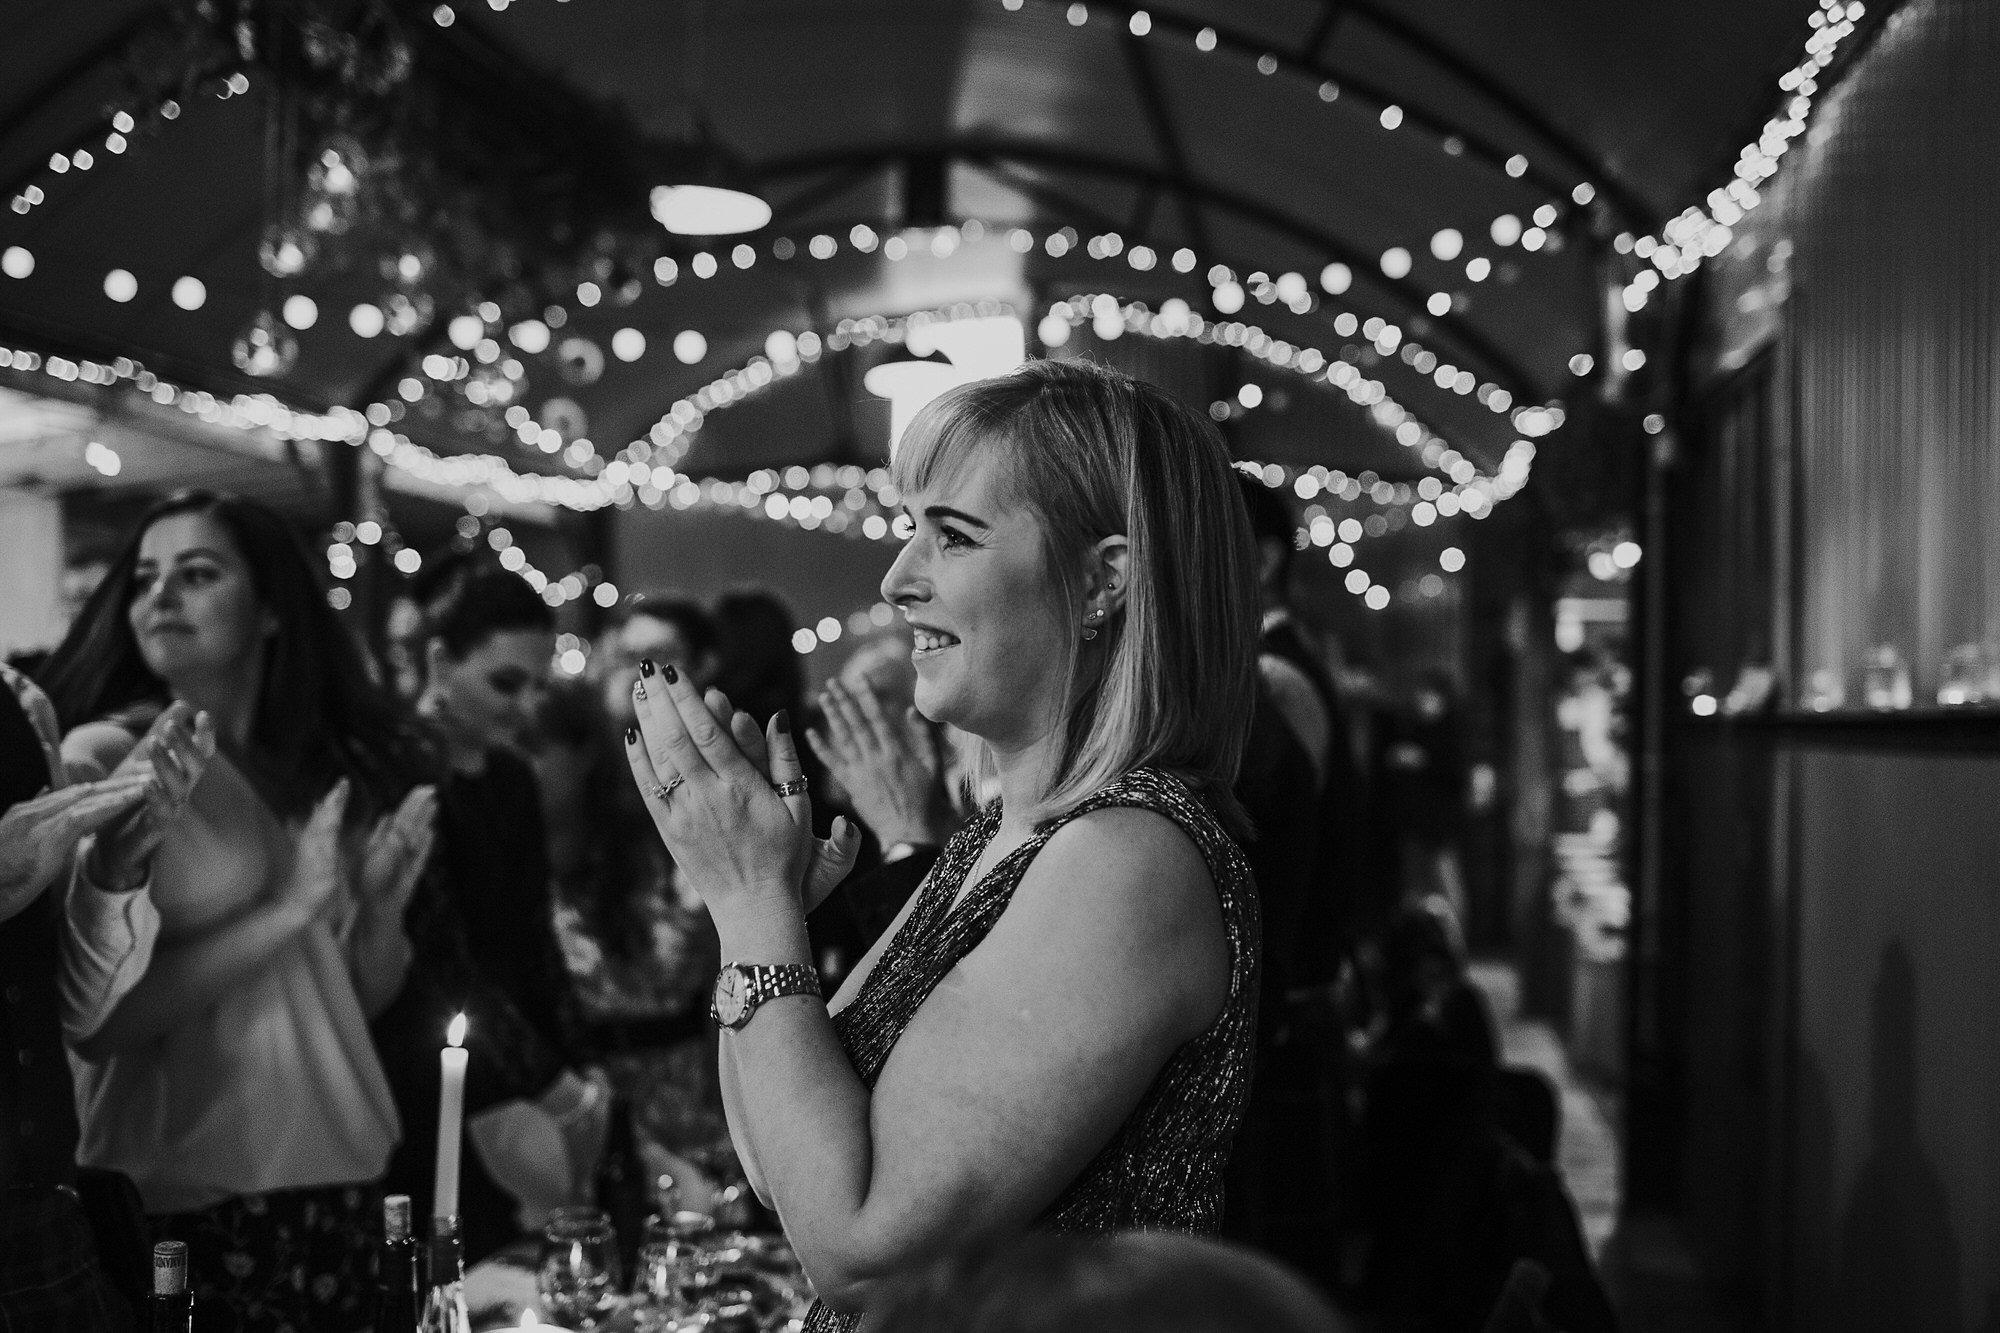 059 TIN SHED KNOCKRAICH FARM WEDDING ALTERNATIVE BRIDE ZOE ALEXANDRA PHOTOGRAPHY